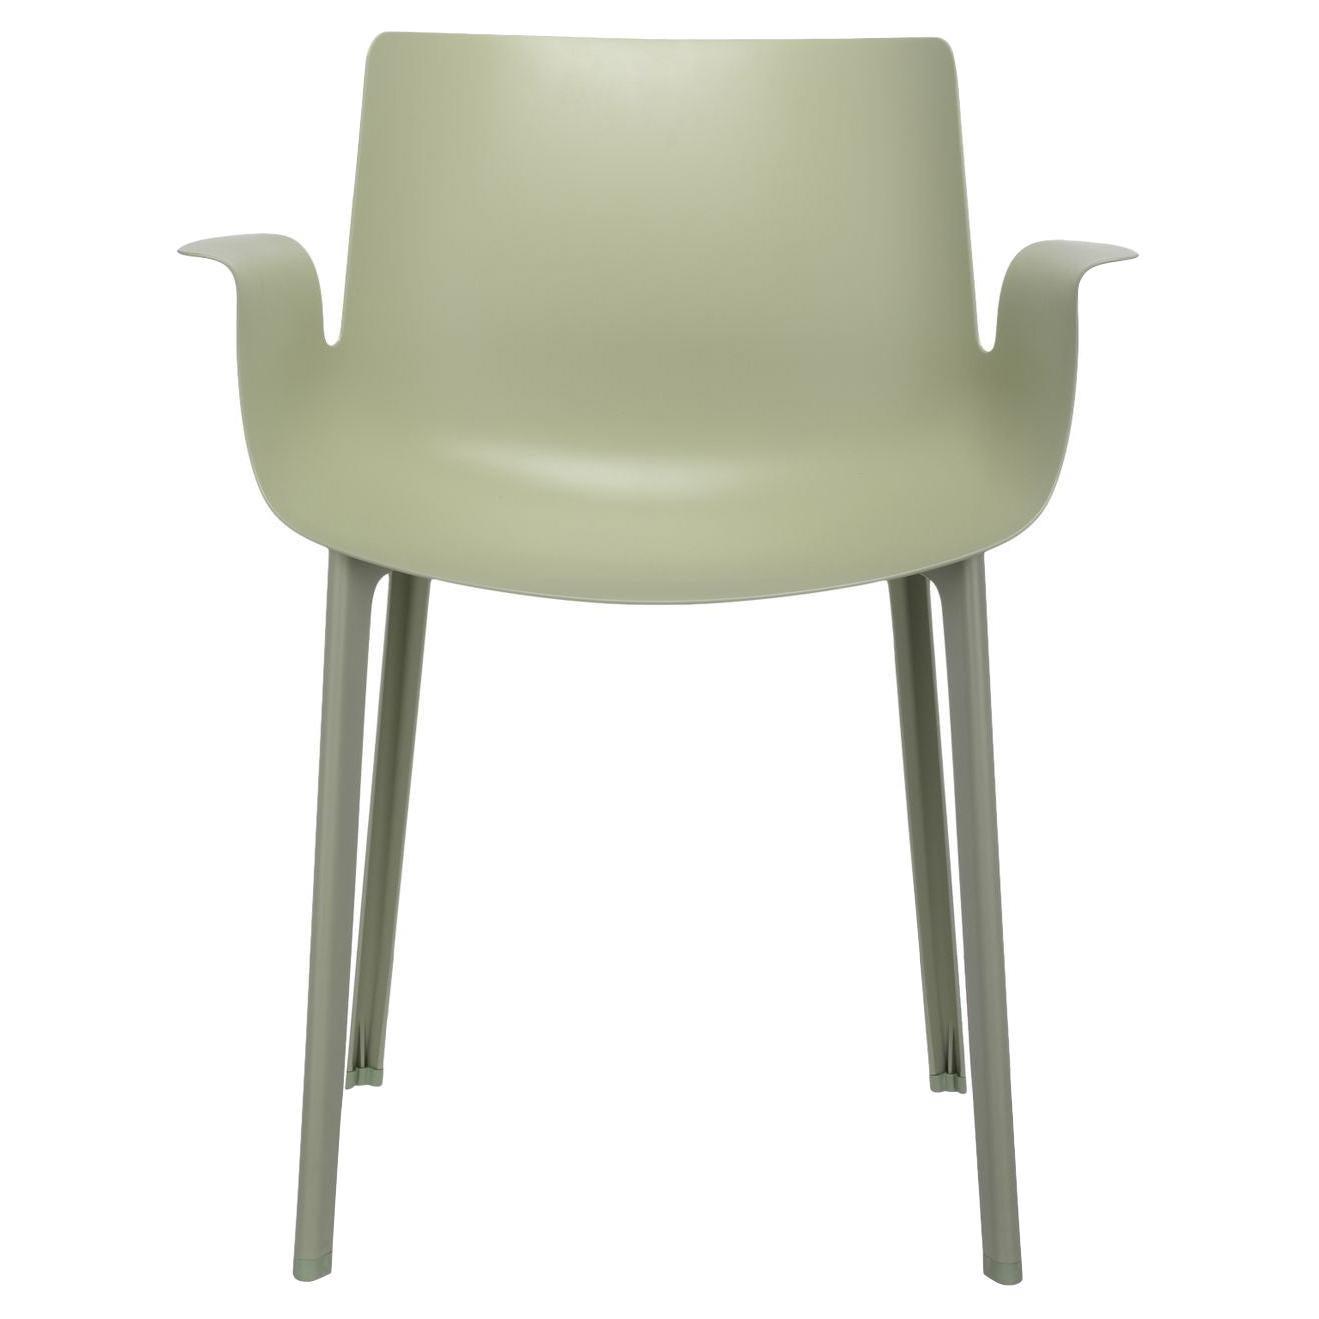 Kartell Piuma Chair in Sage by Piero Lissoni